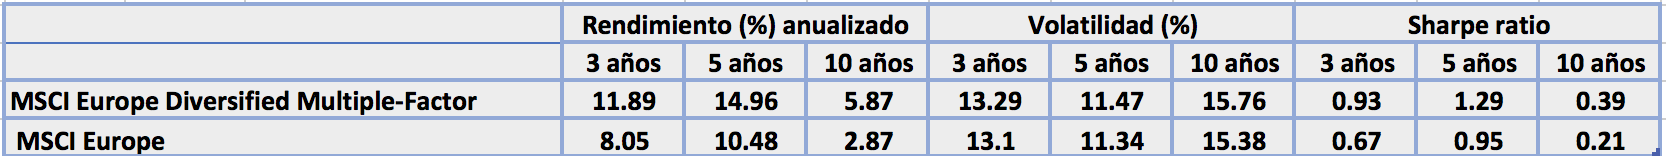 Fuente MSCI rendimiento anualizado MSCI Europe vs MSCI Diversified Multifactor